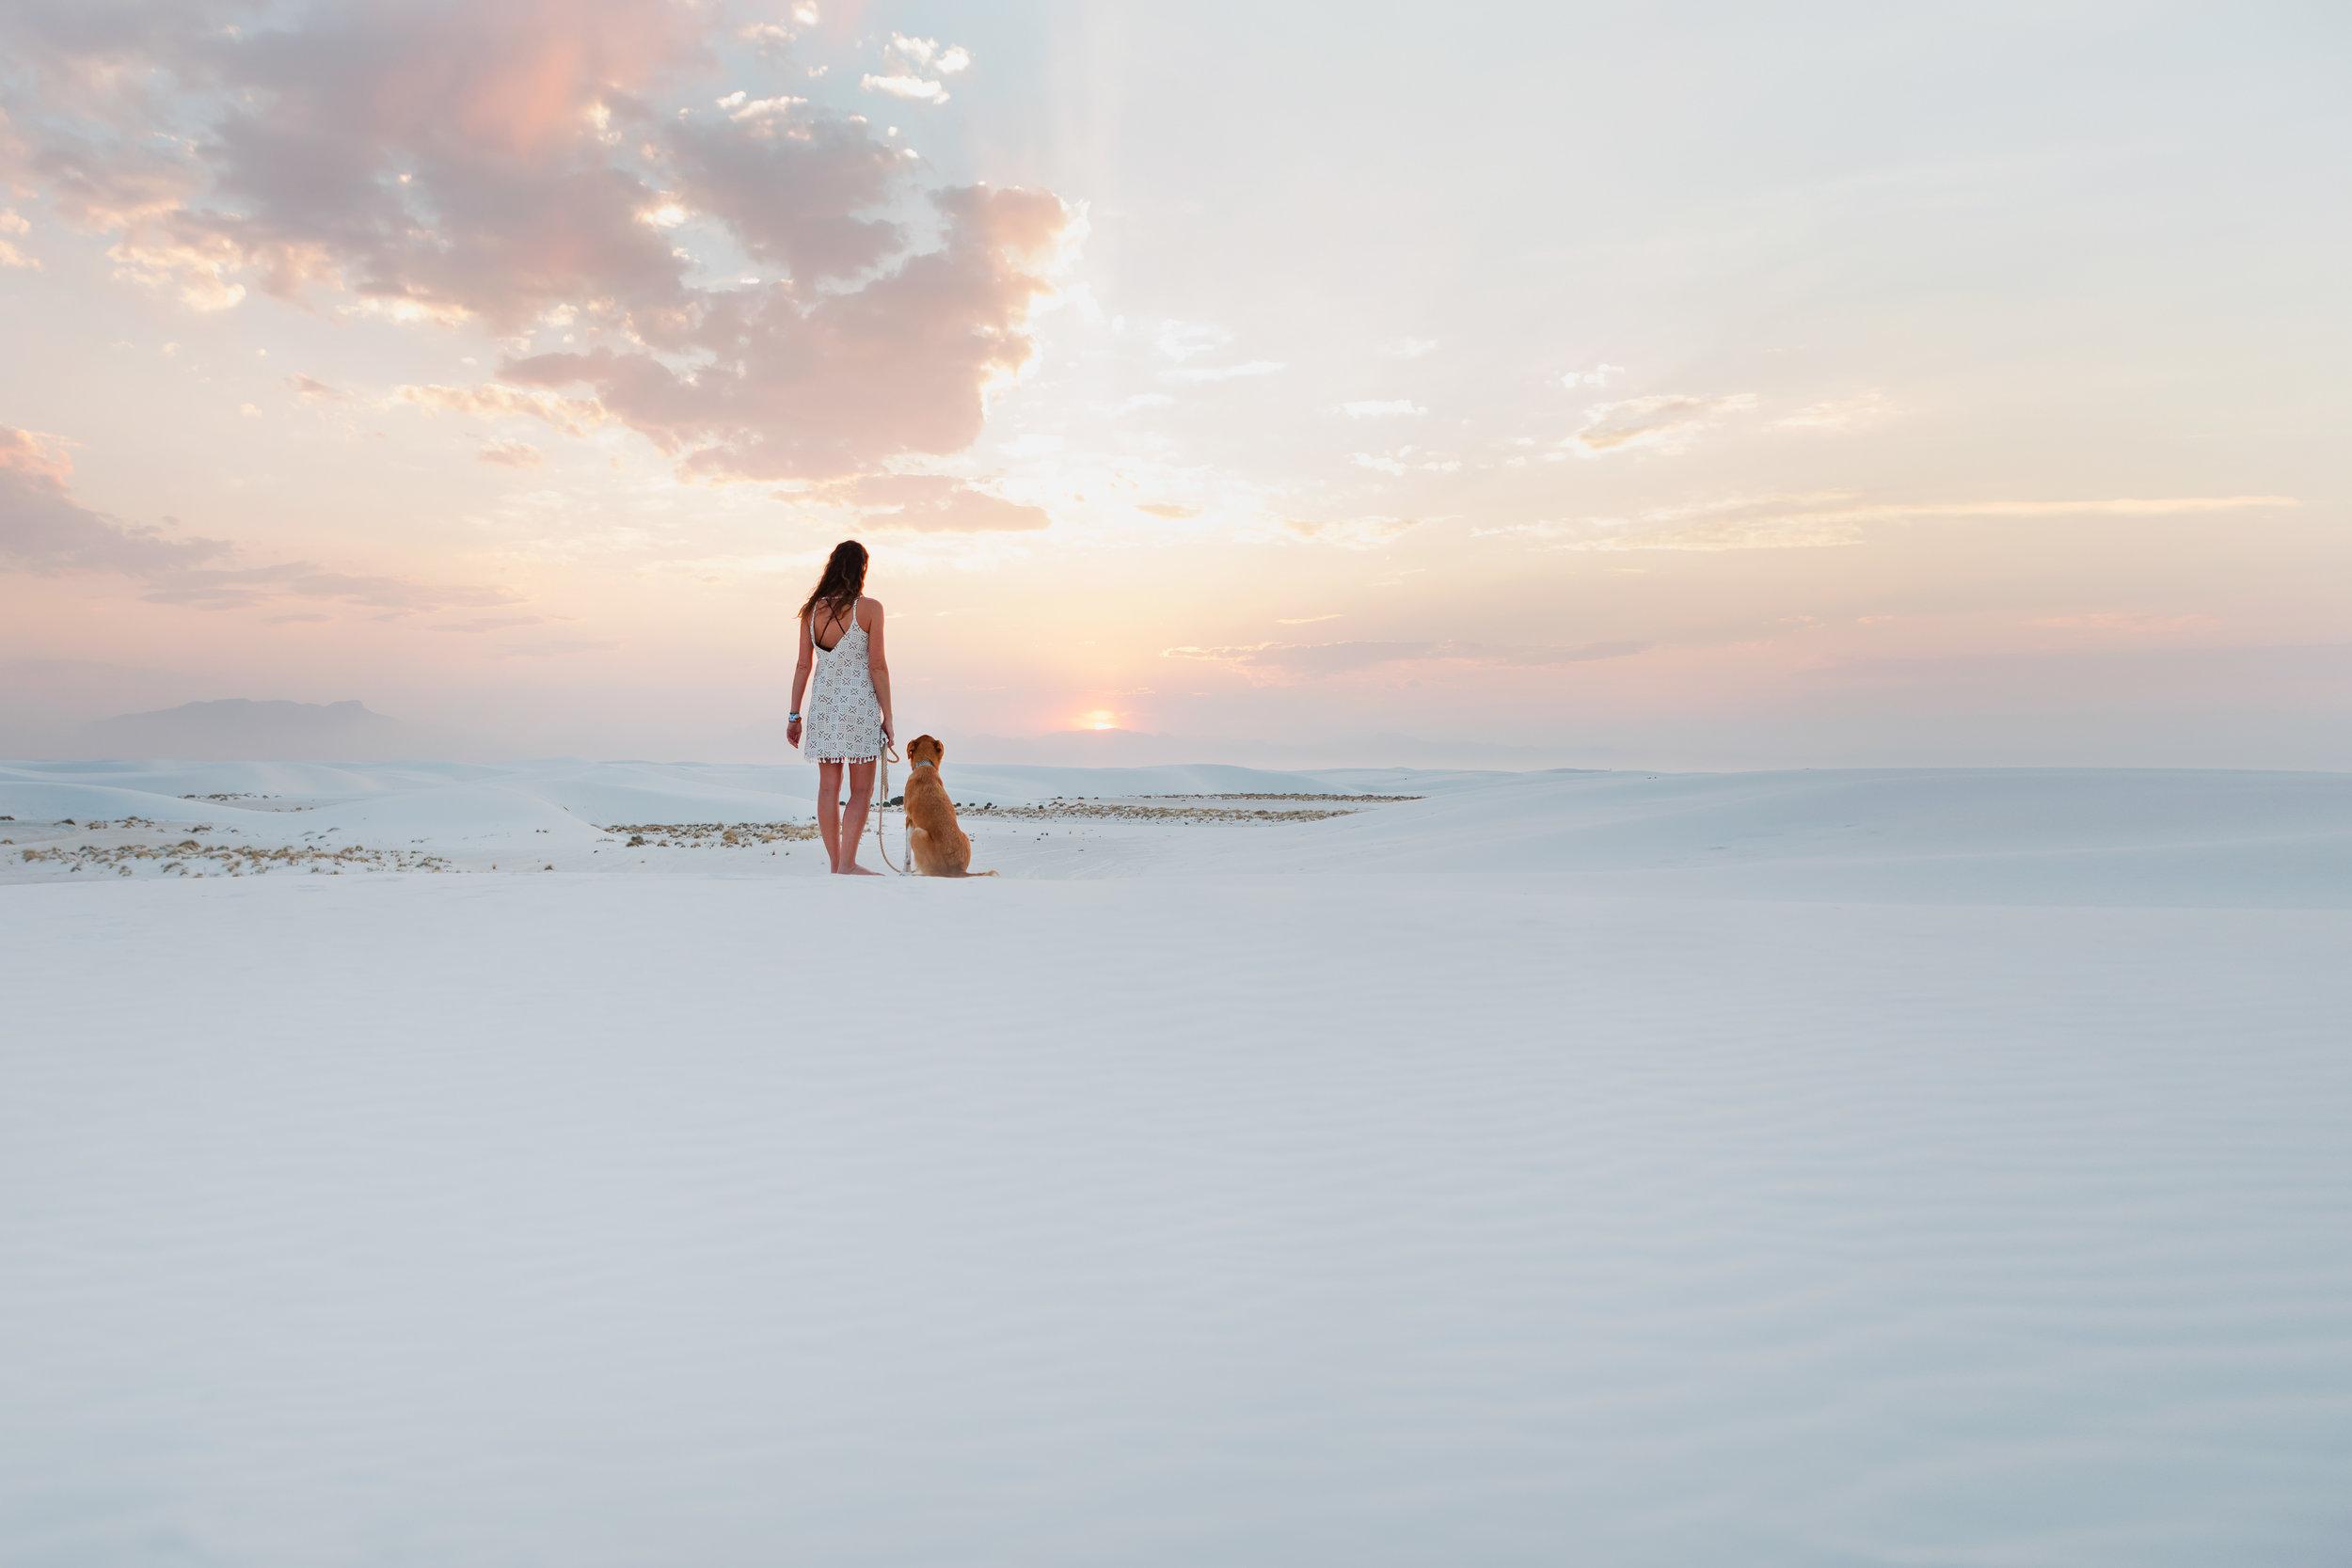 White Sands National Monument, NM | June 2017